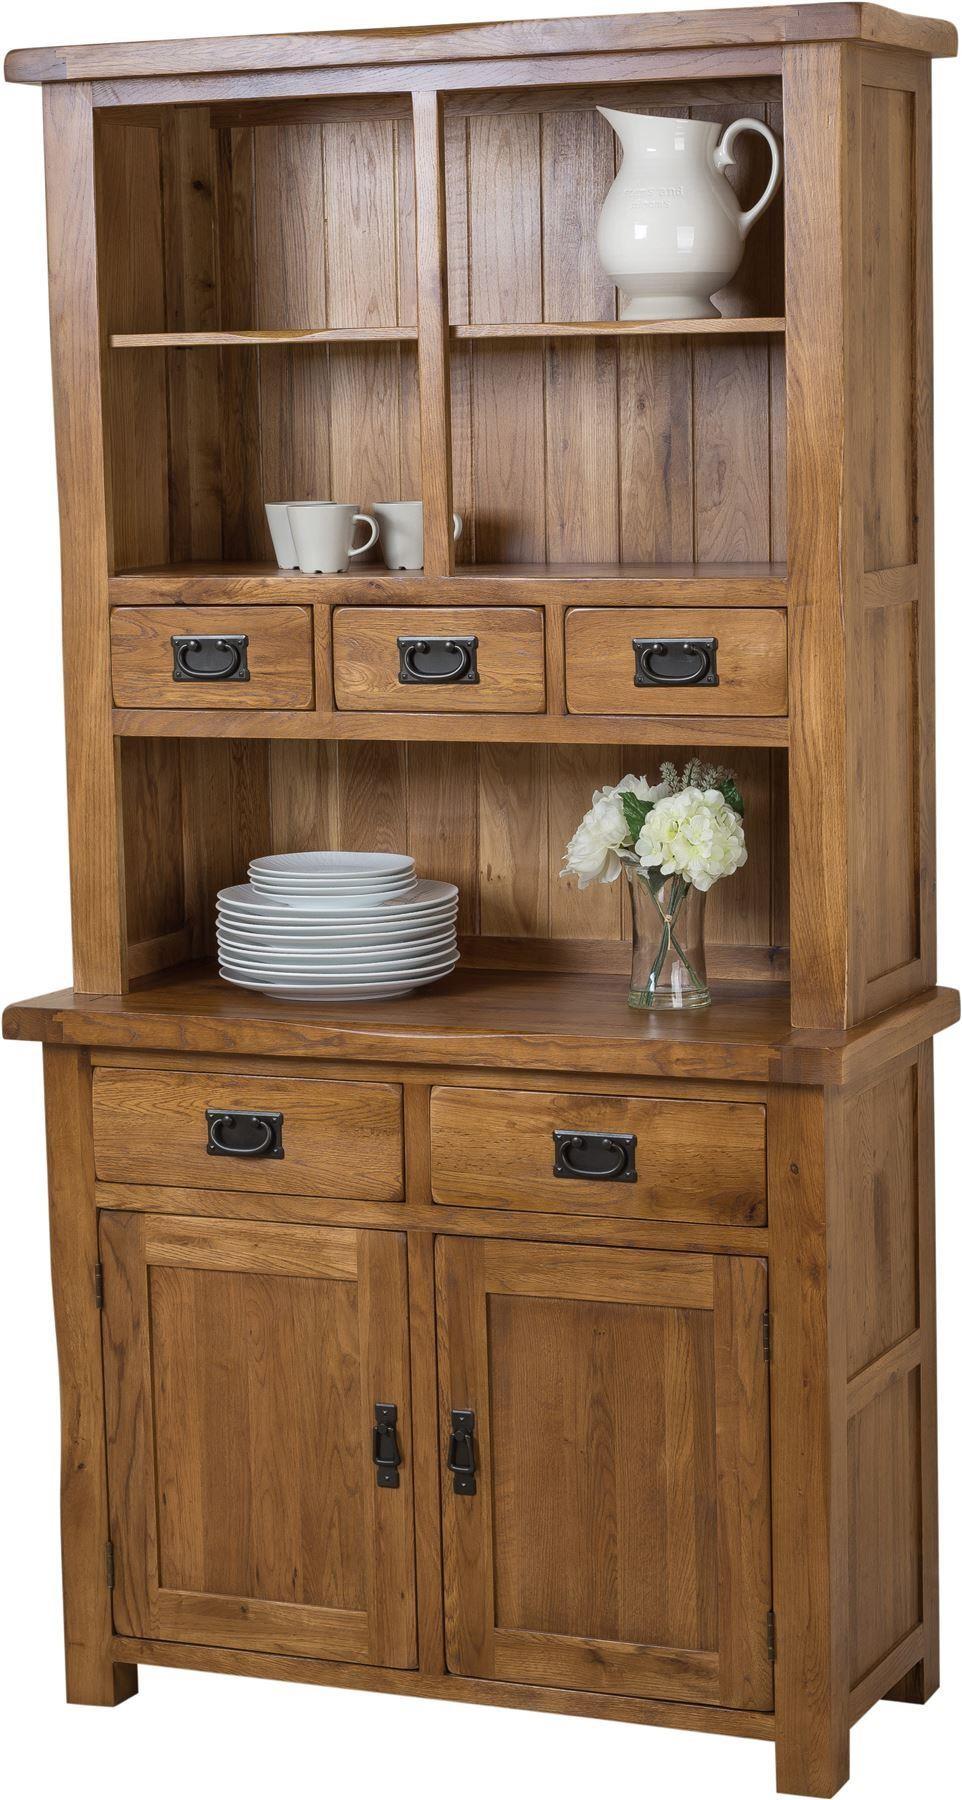 Cotswold Rustic Solid Oak Small Welsh Dresser